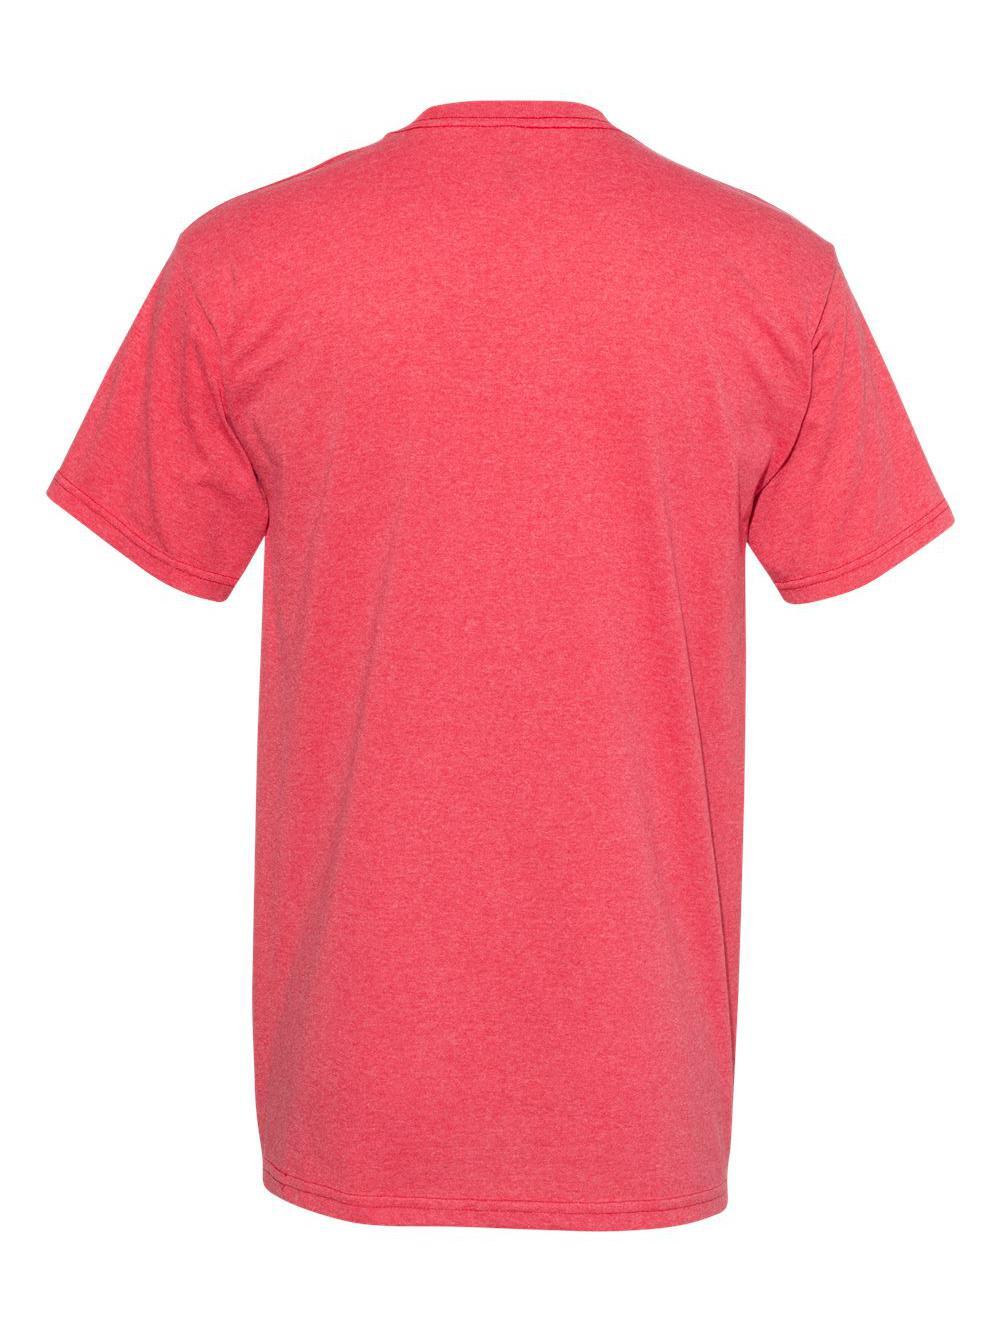 ALSTYLE-Premium-T-Shirt-1701 thumbnail 47